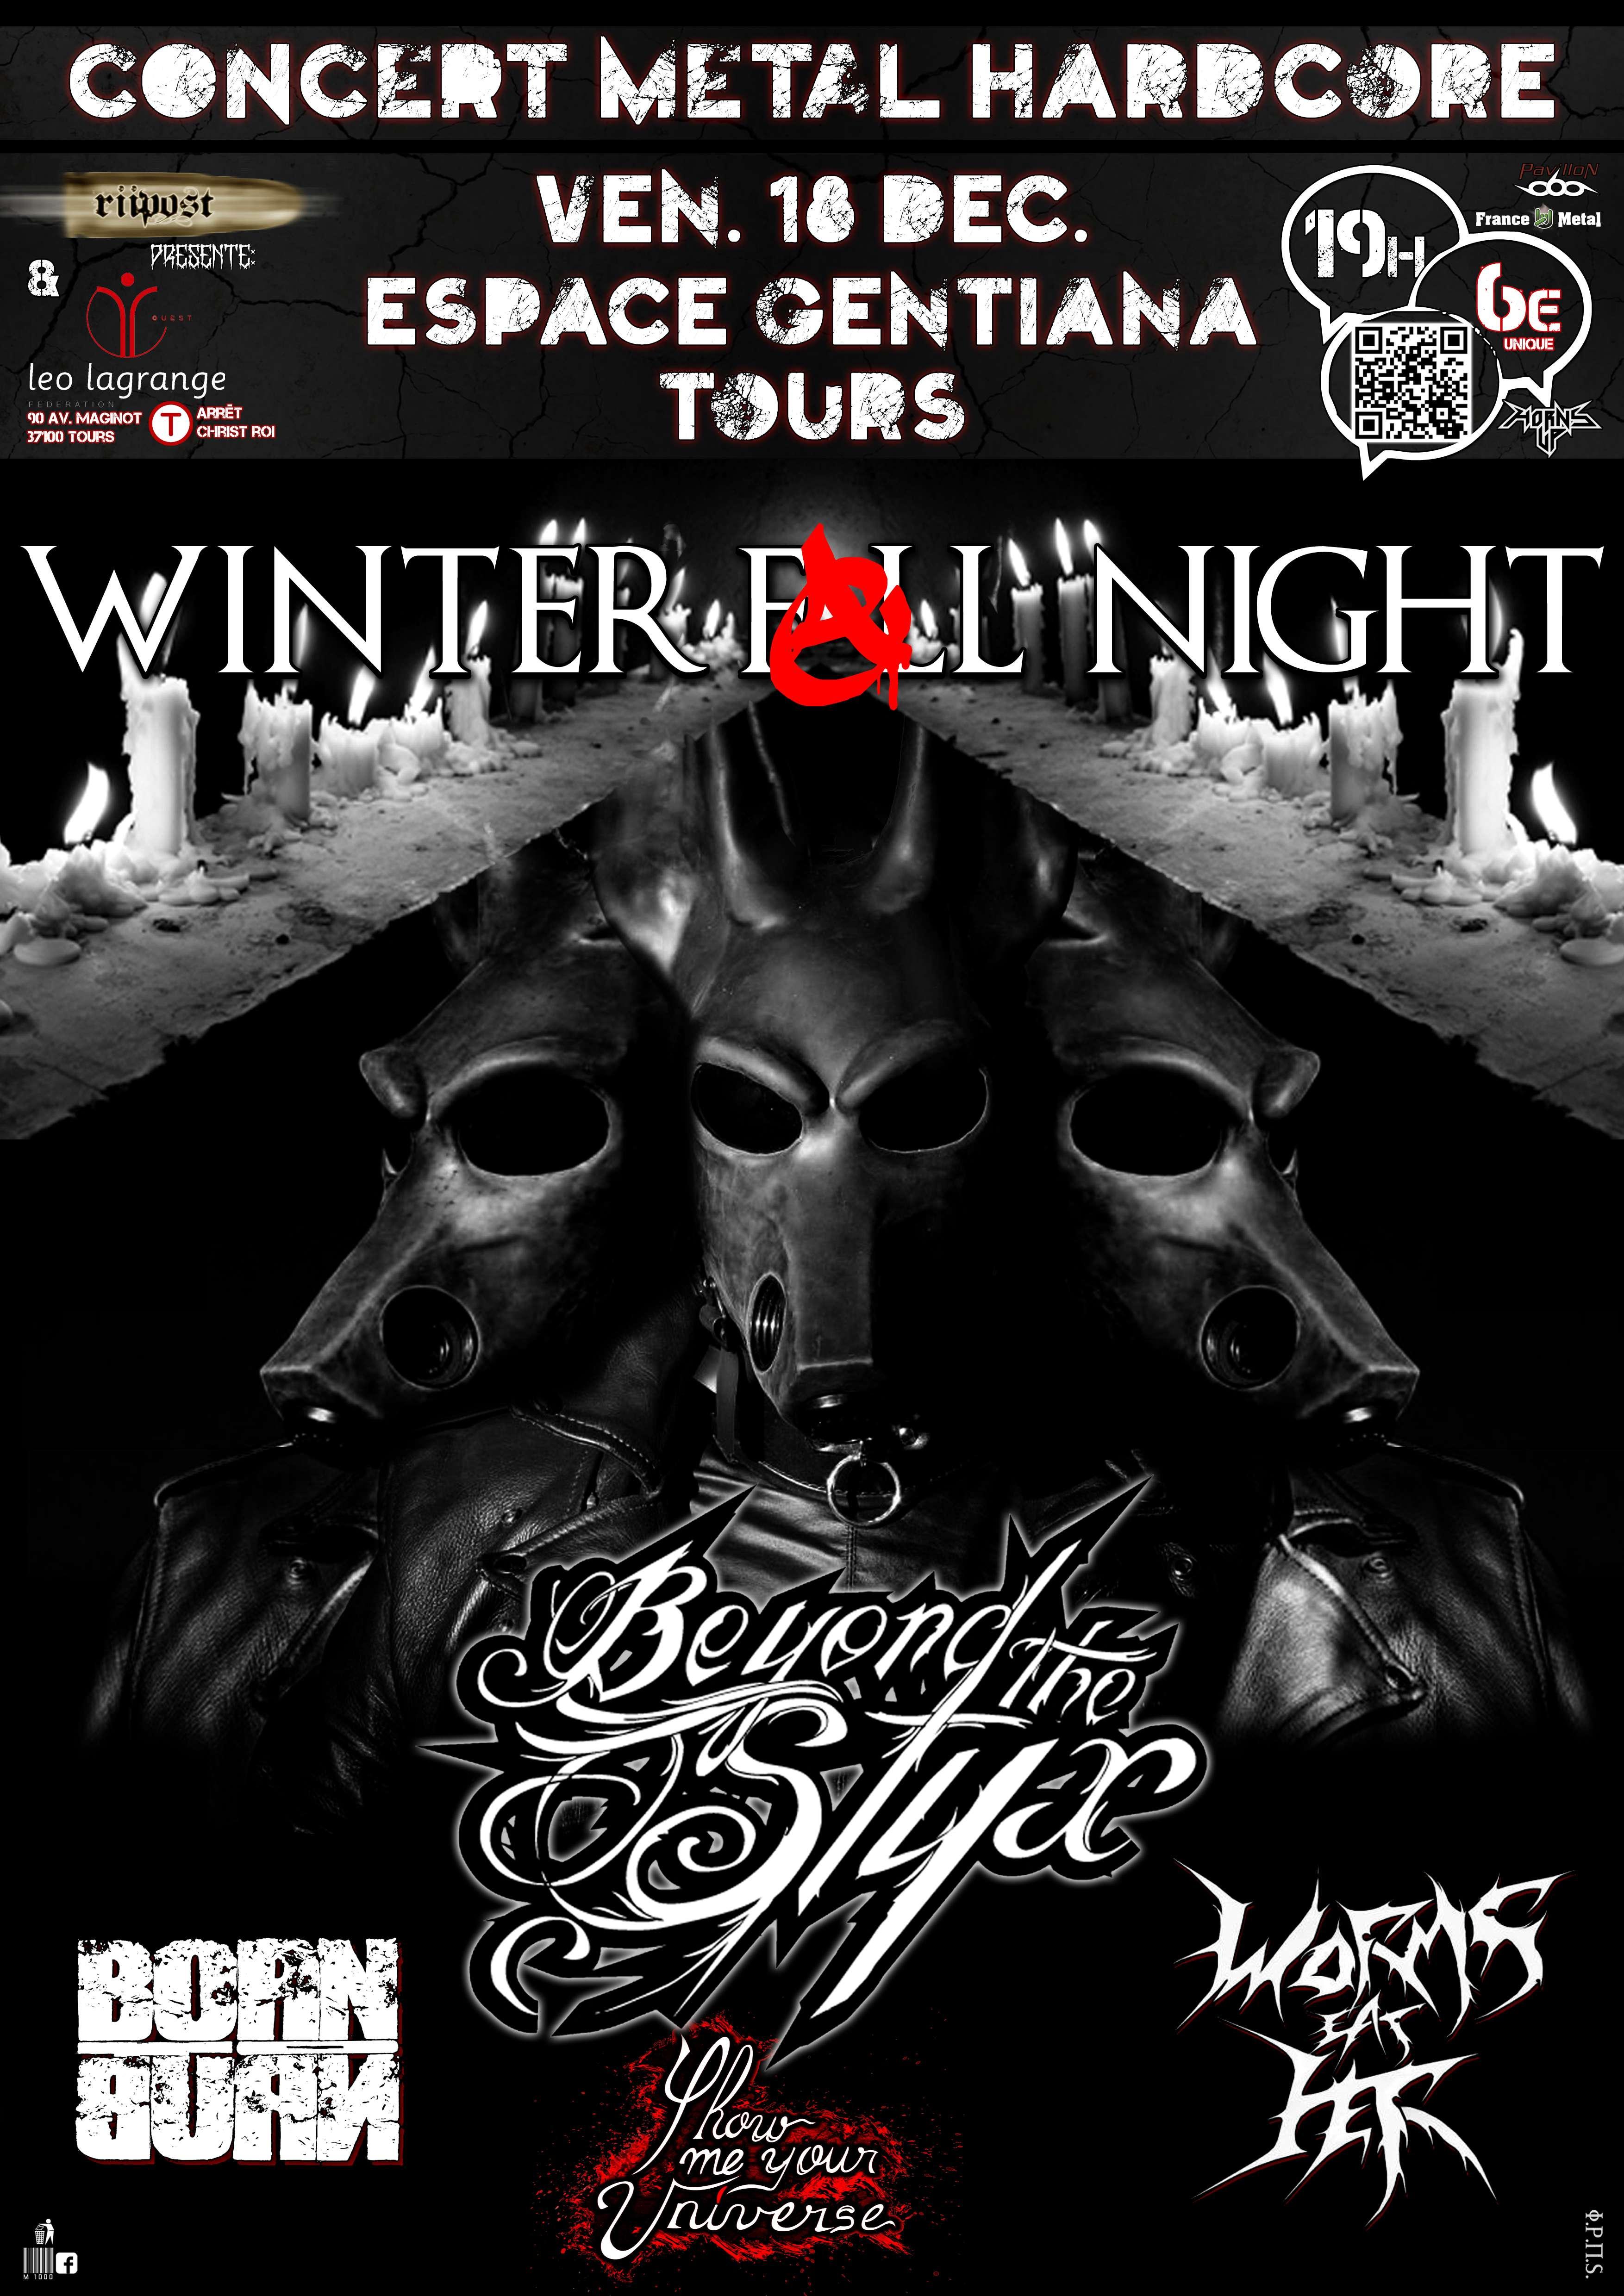 BEYOND THE STYX [Tours - 37] > 18-12-2015